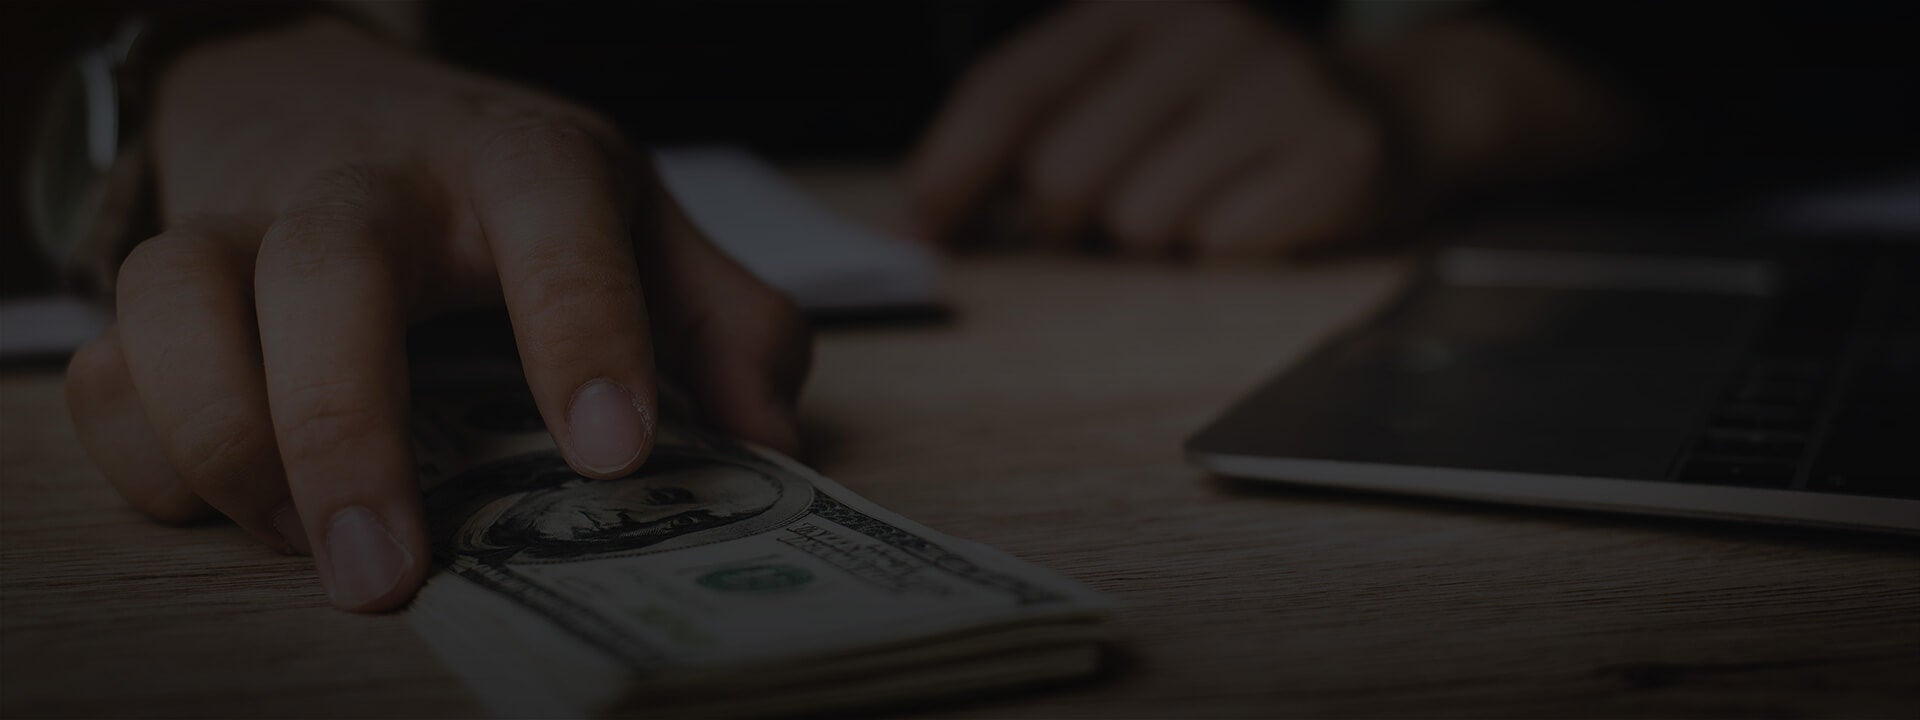 Applying Intelligent Automation to the 2 Trillion Global Problem of Money Laundering BG